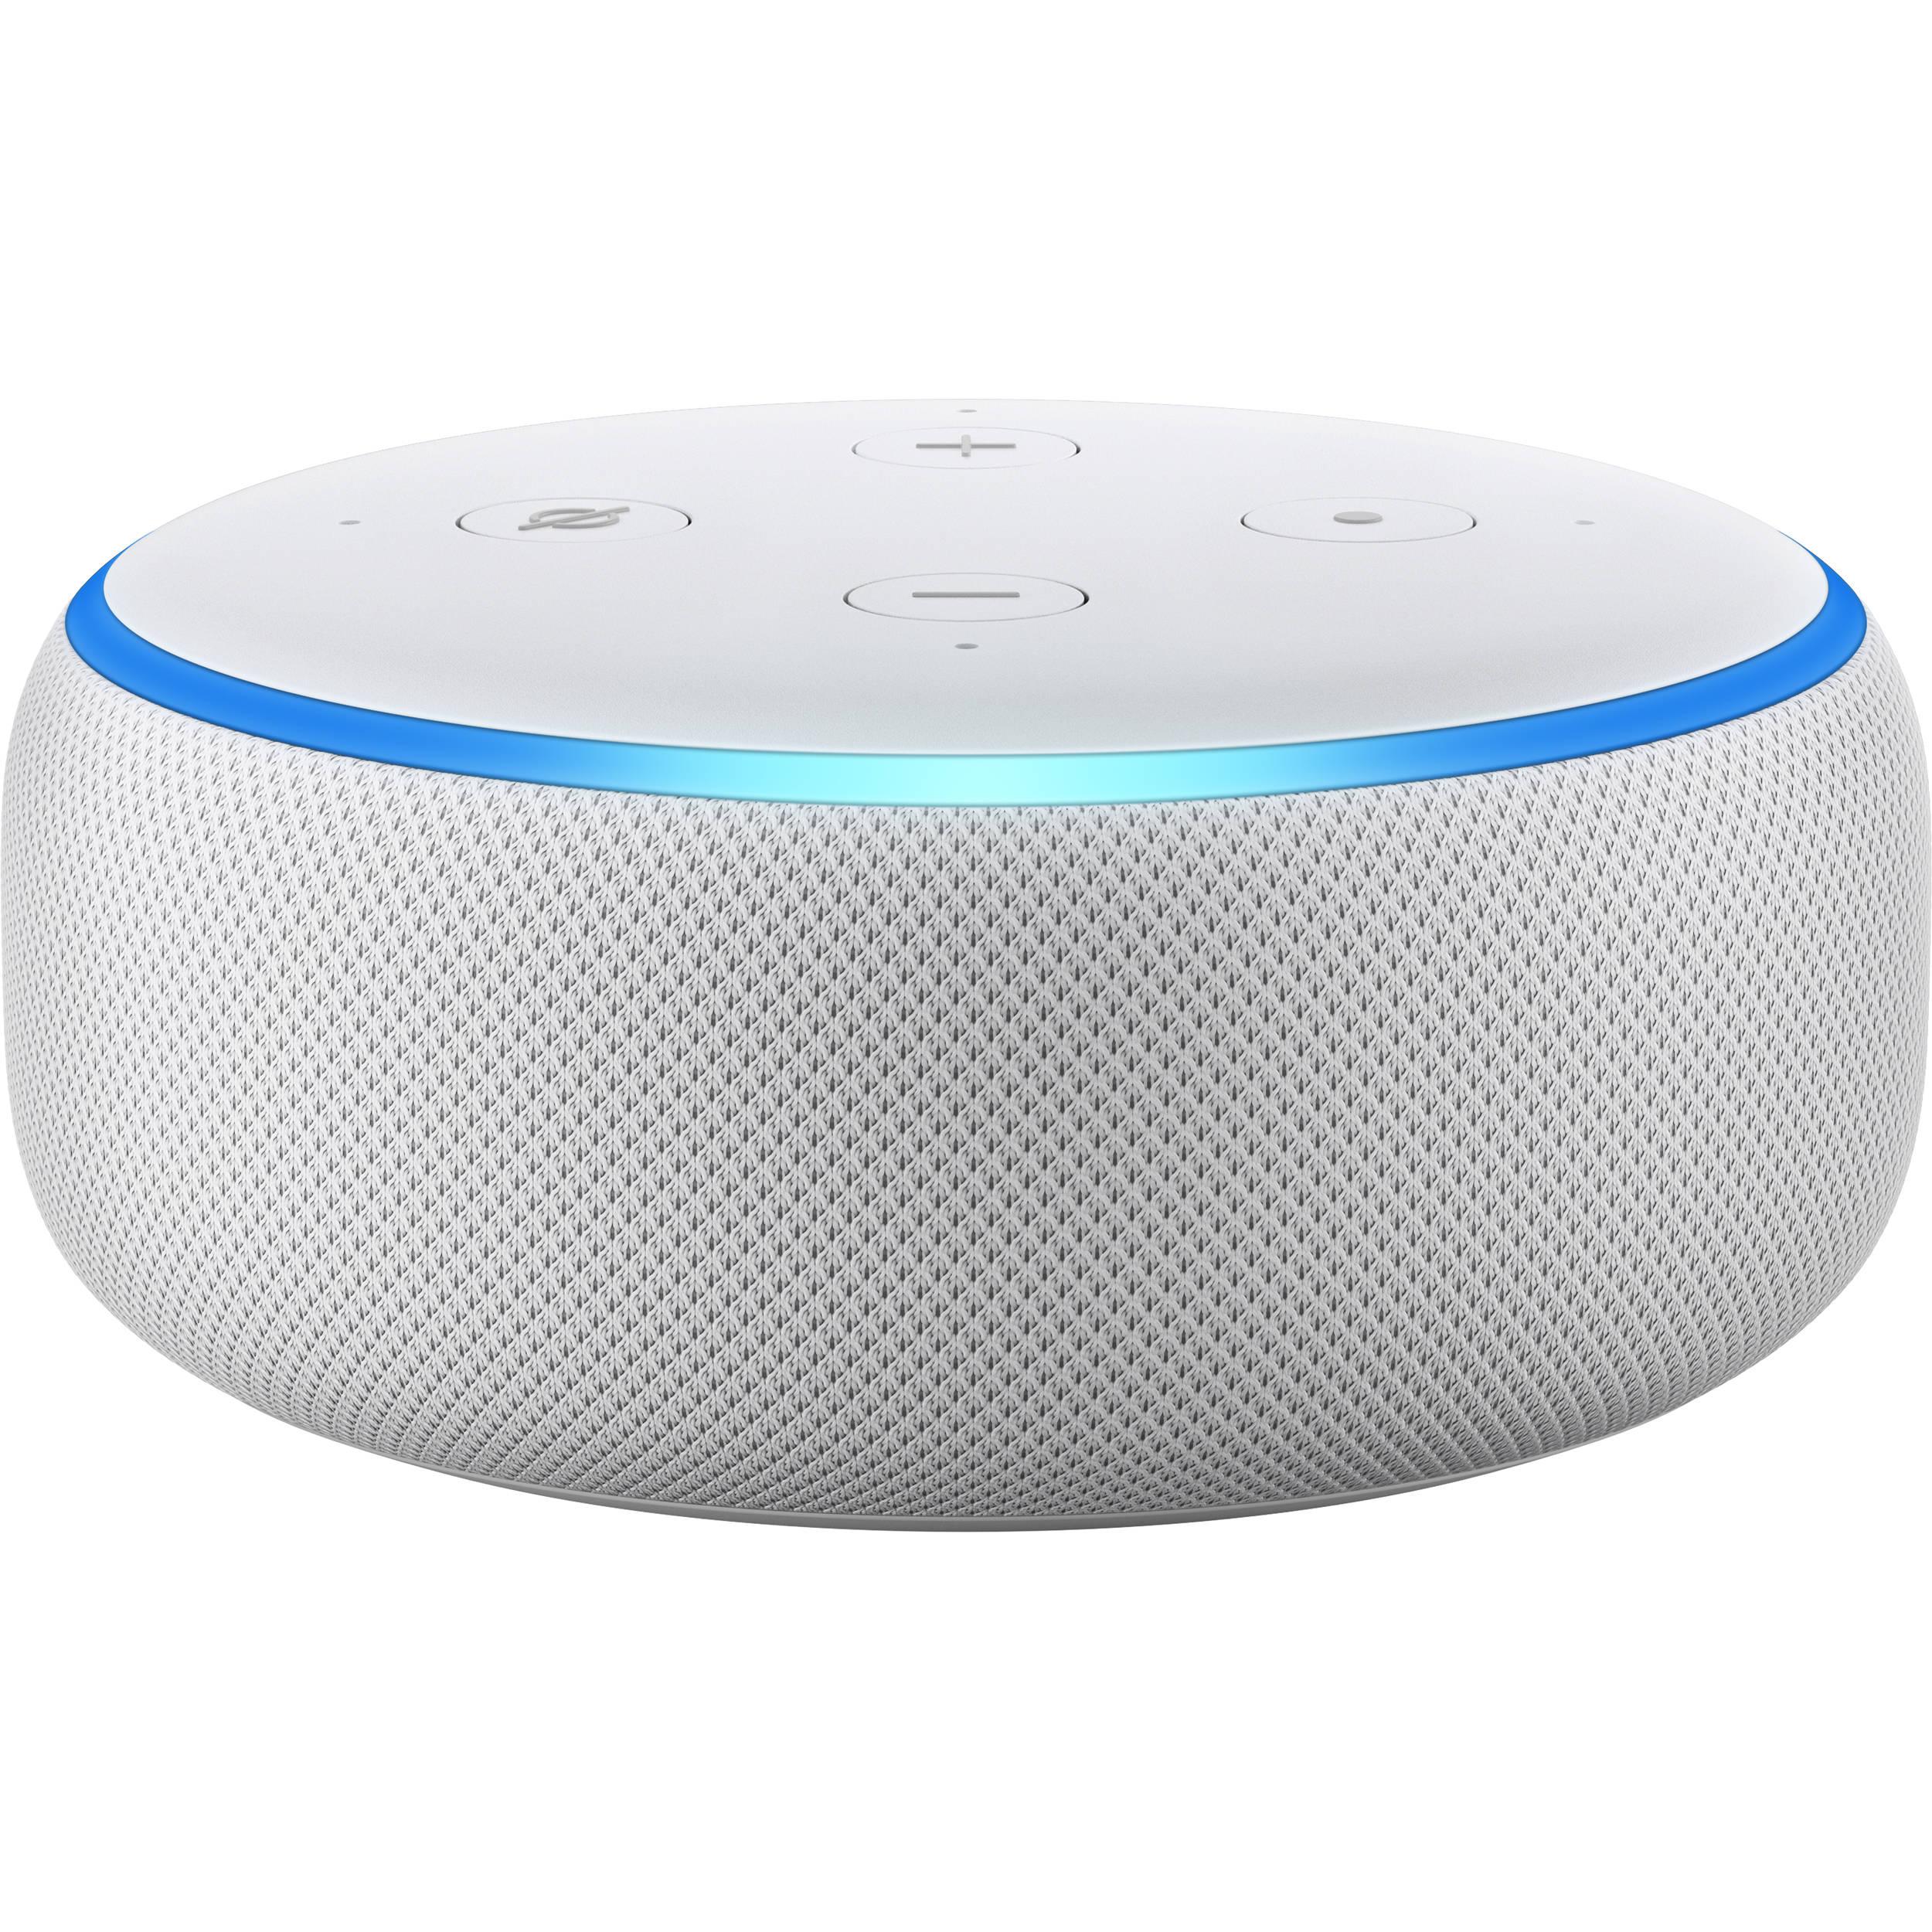 Echo Dot (3rd Gen) - Smart speaker with Alexa $29.99